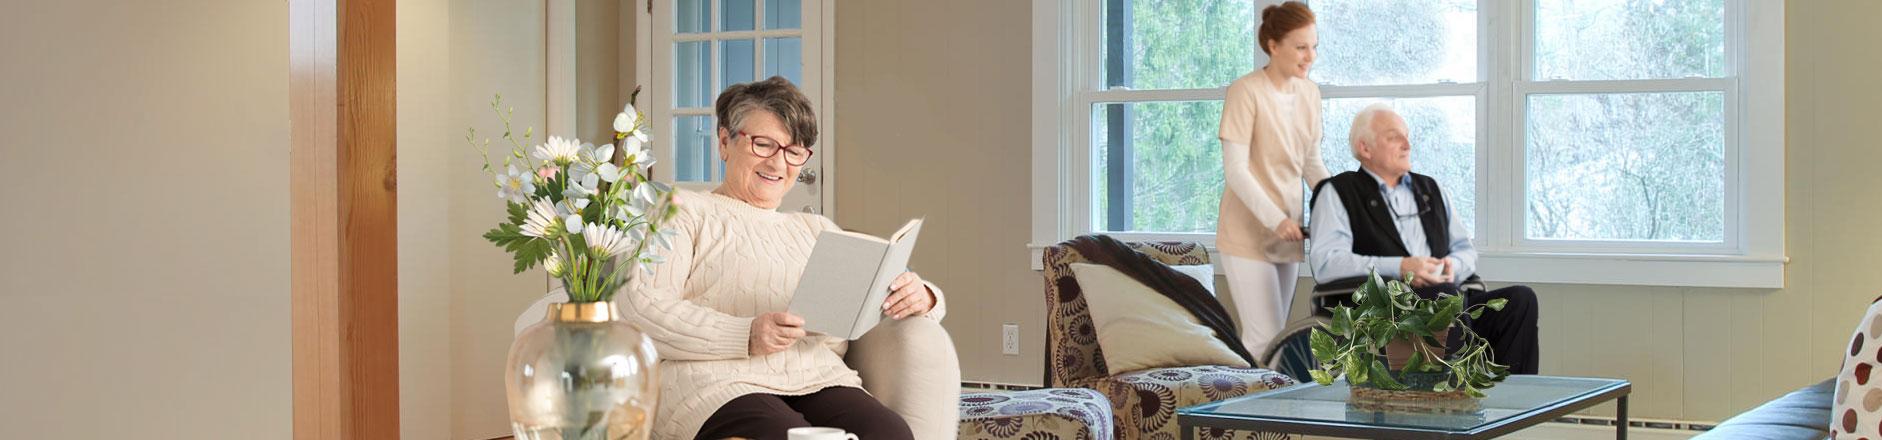 Home Health Aide Care